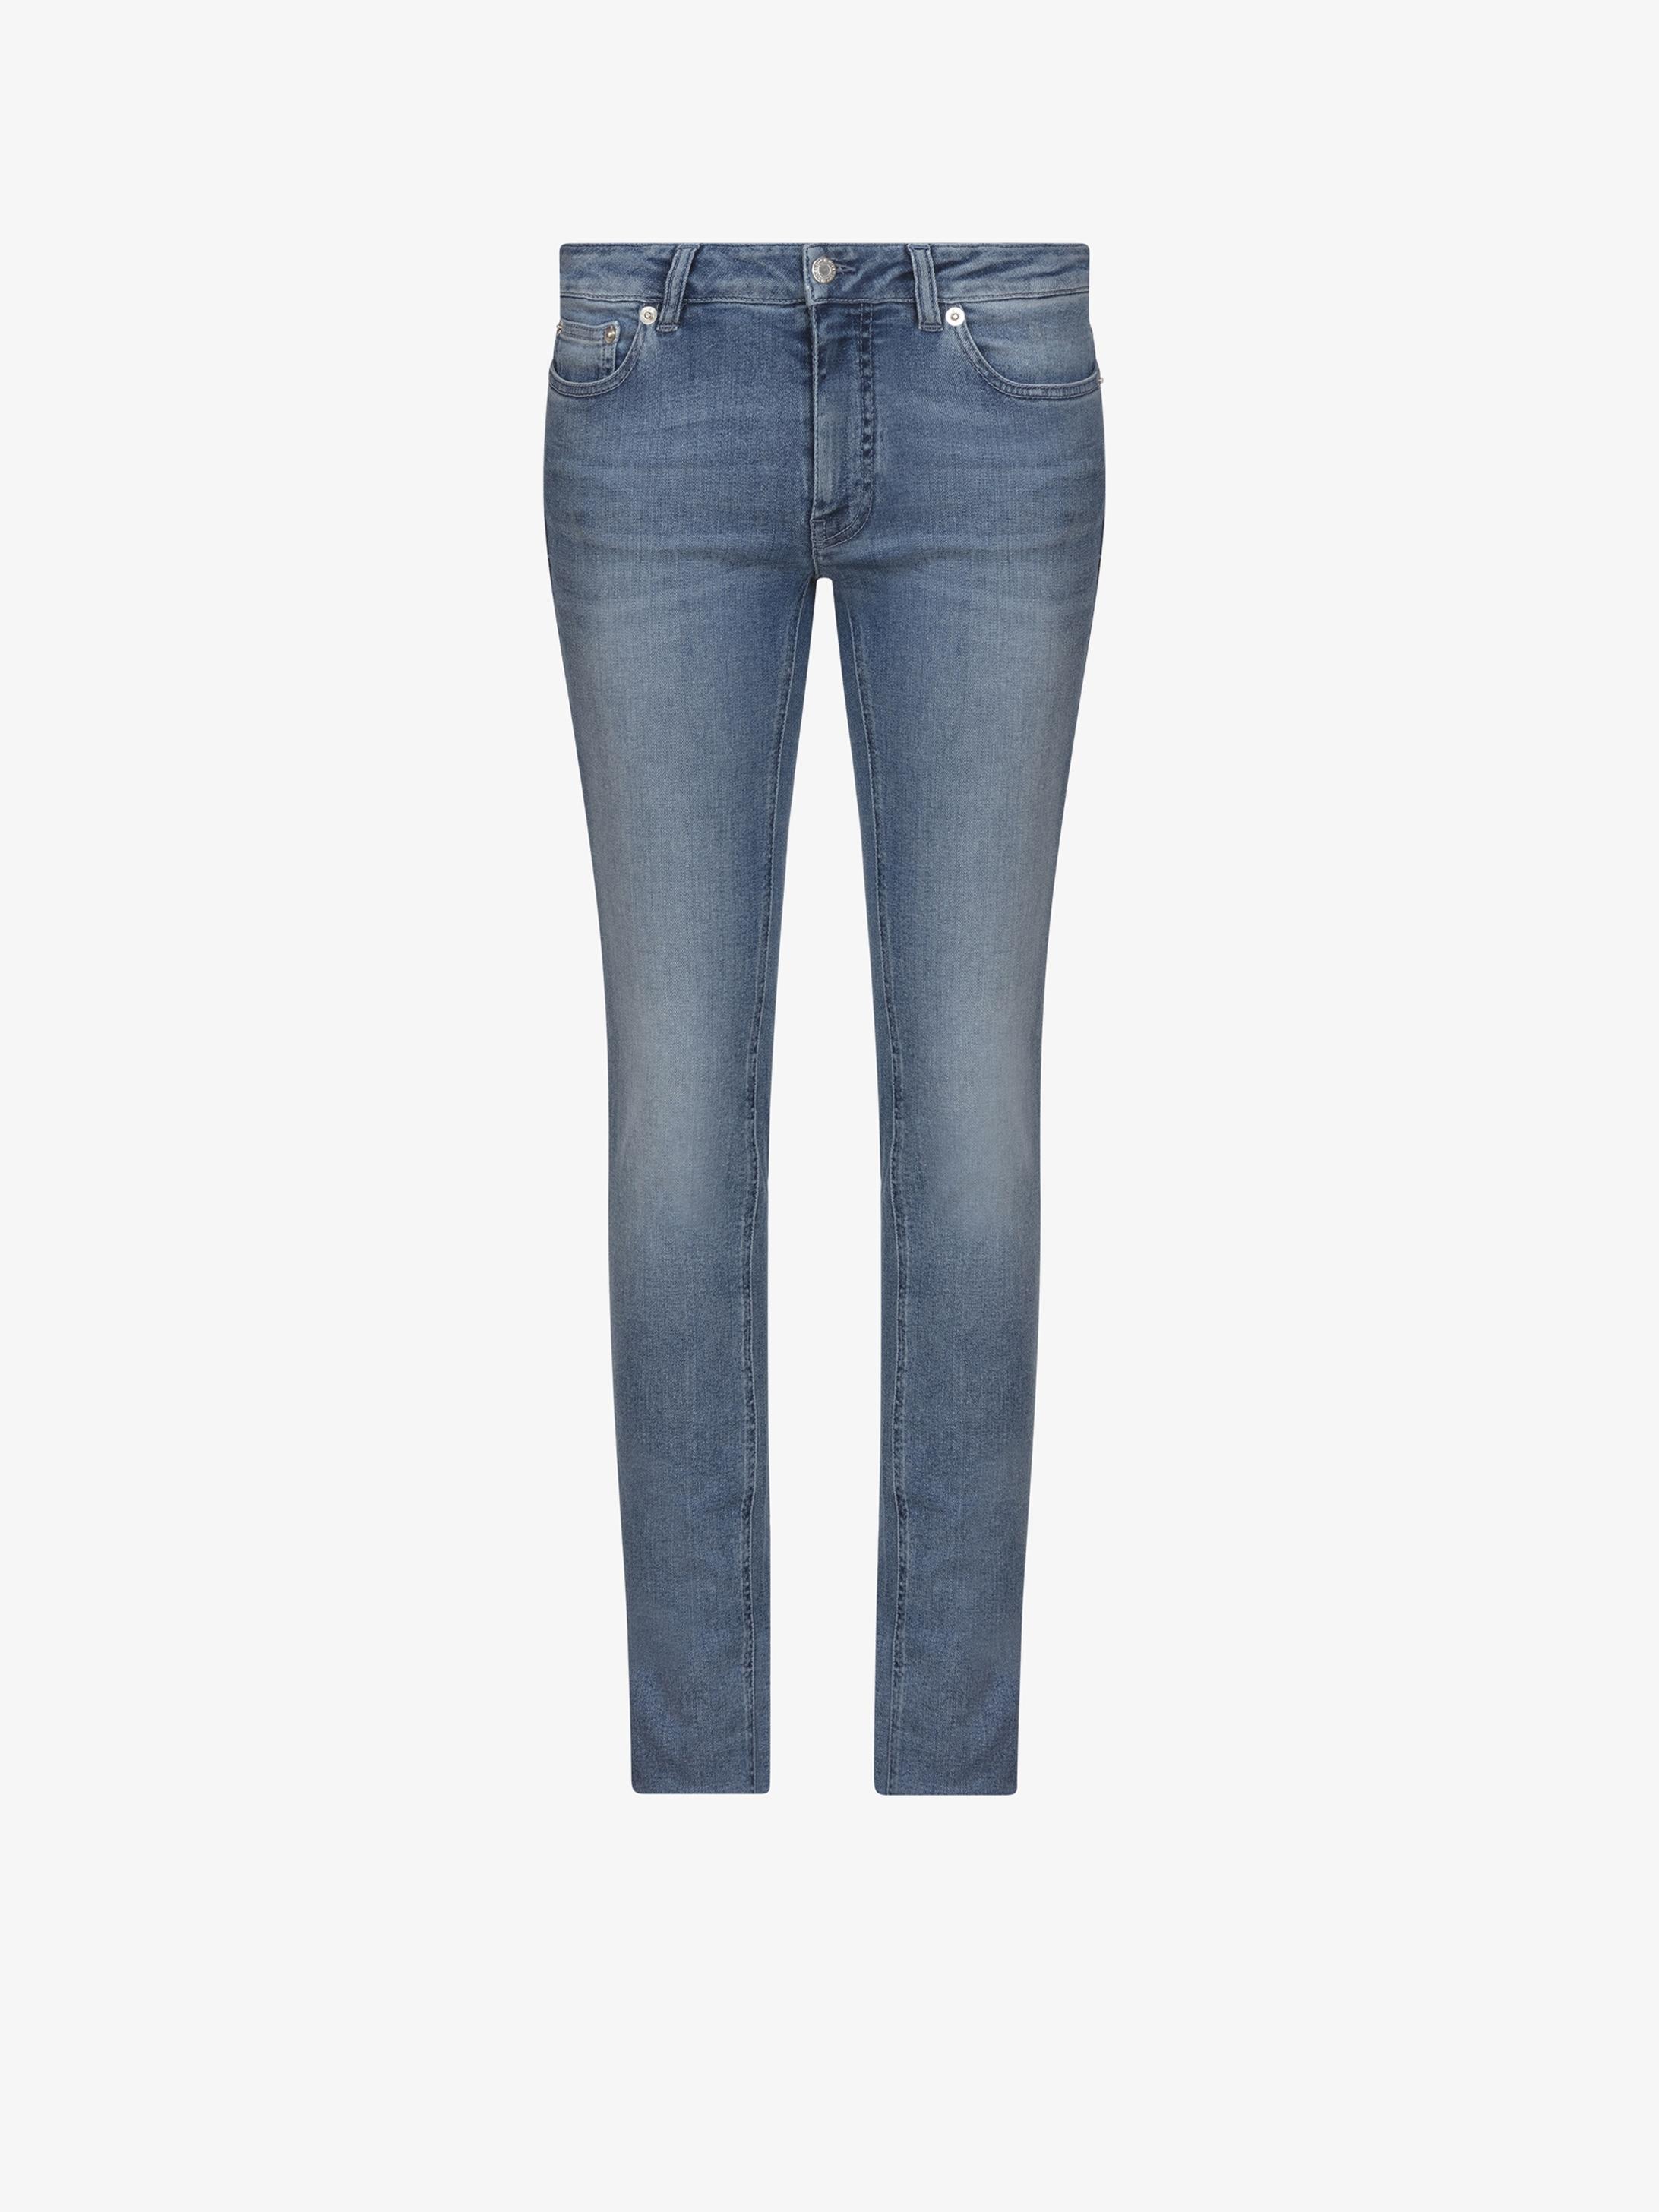 Back stars denim jeans